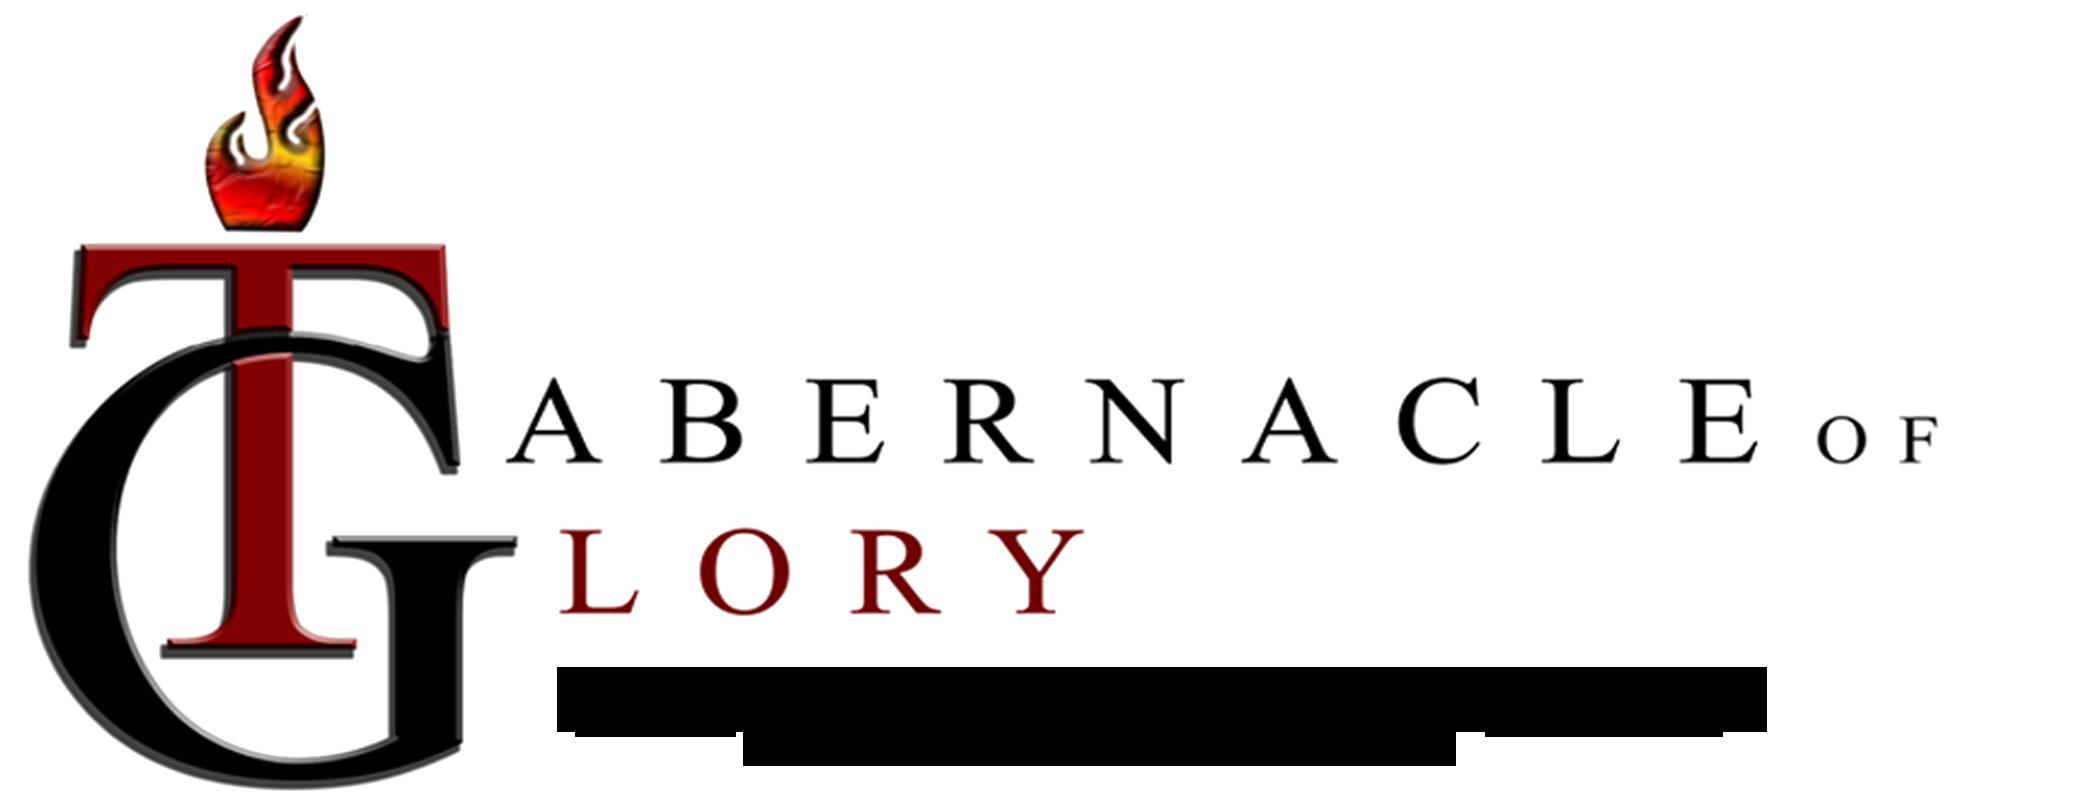 Tabernacle of Glory